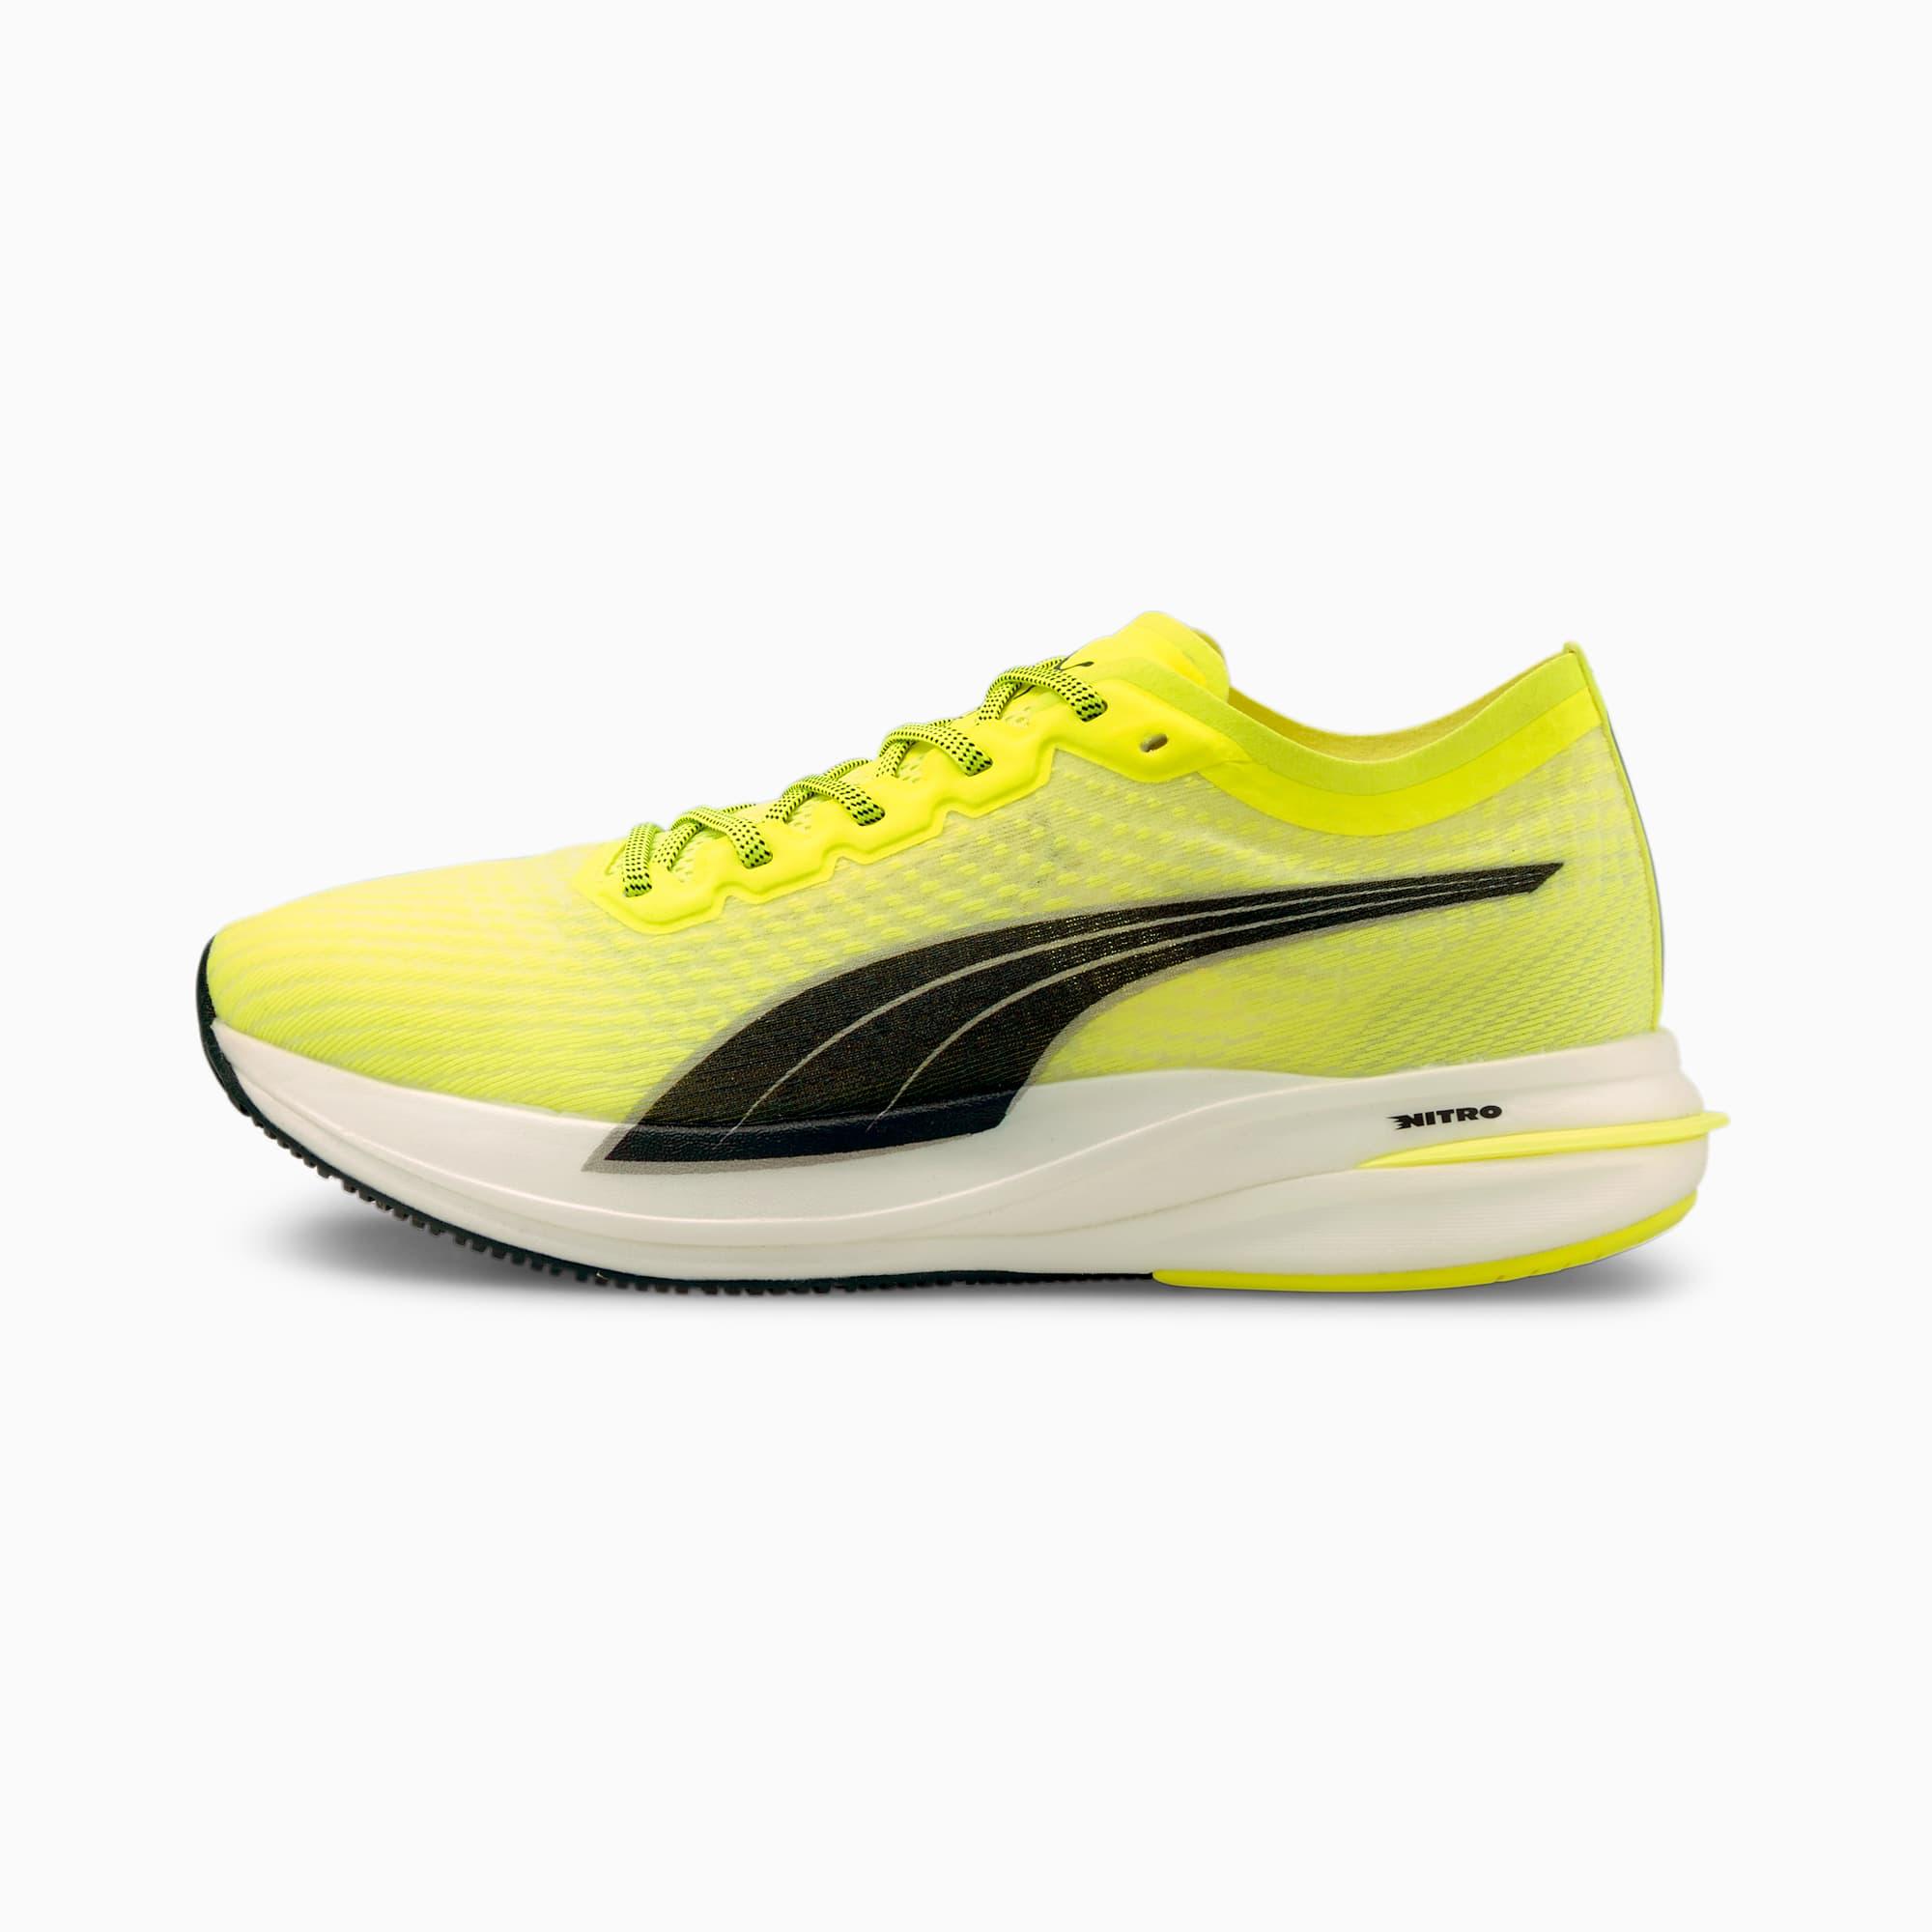 Deviate Nitro Men's Running Shoes